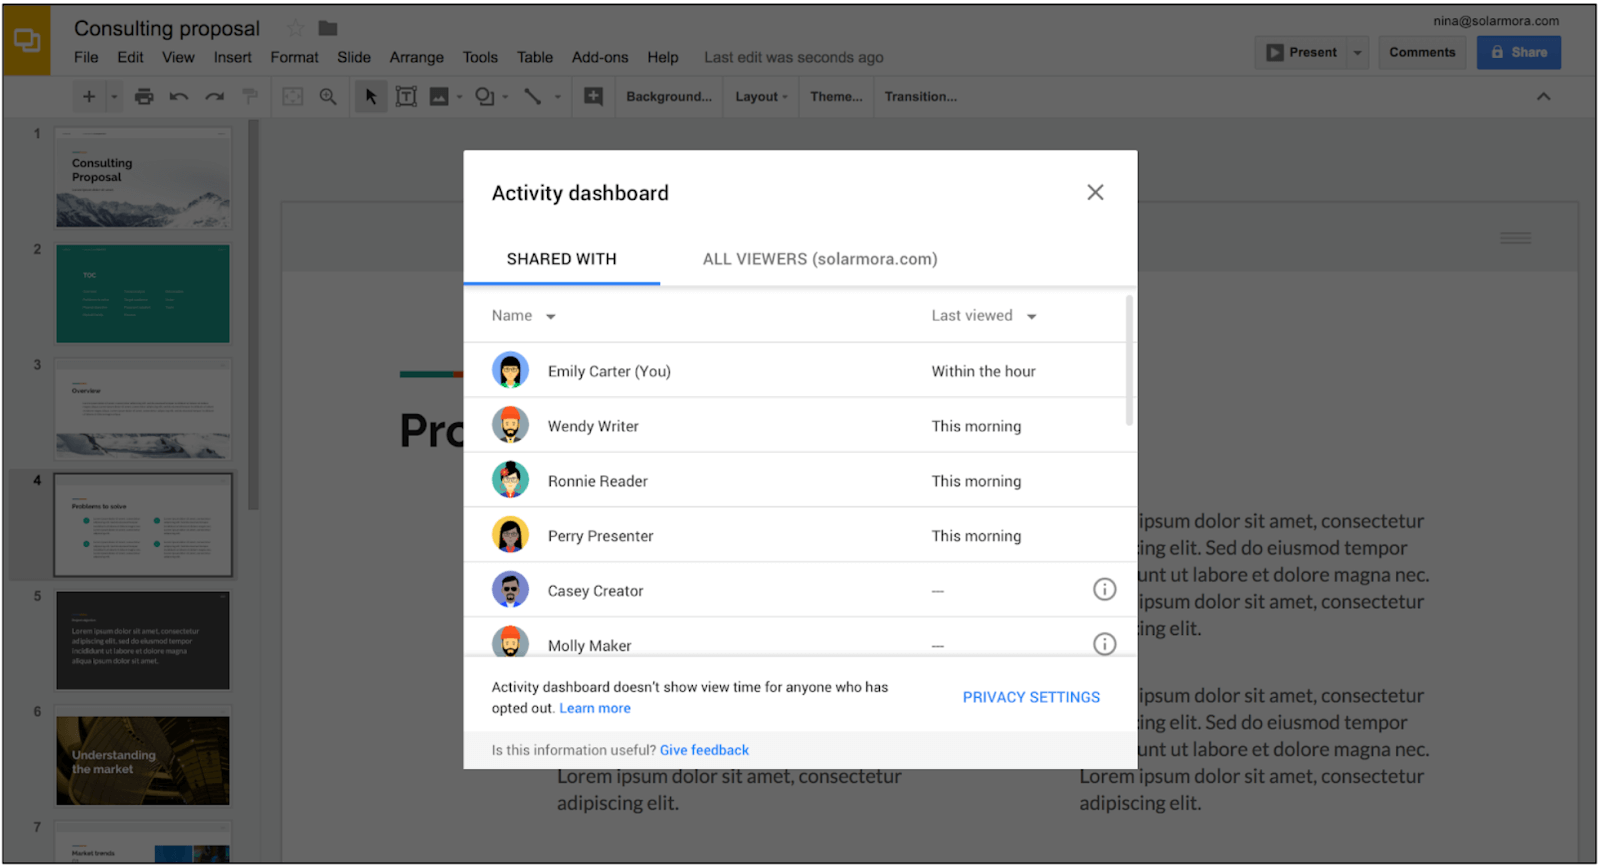 G Suite Activity Dashboard